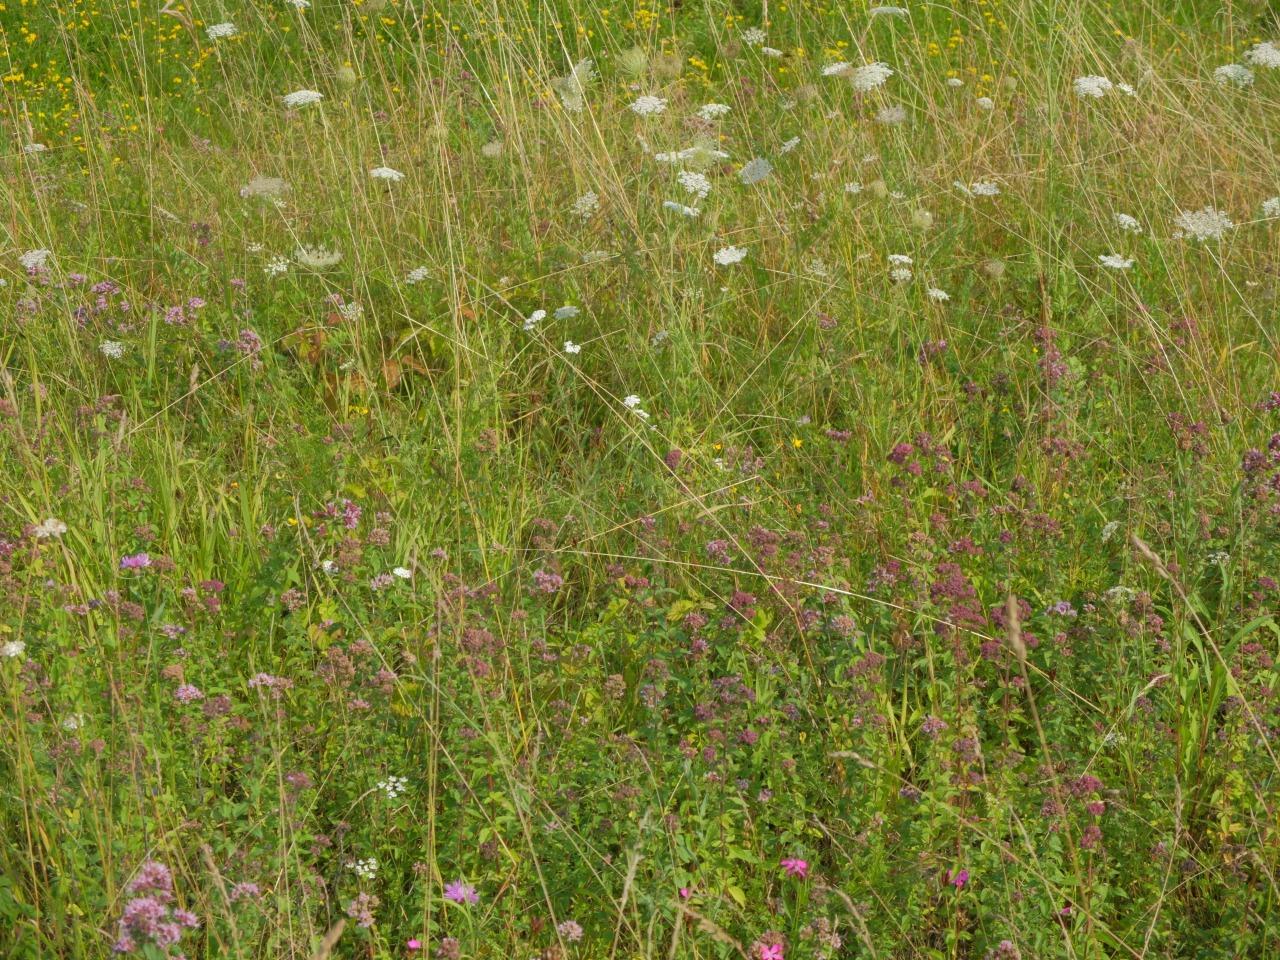 mangia minga // 'Wildkräuter: Foraging Wild Herbs' Wilder Oregano - wild oregano